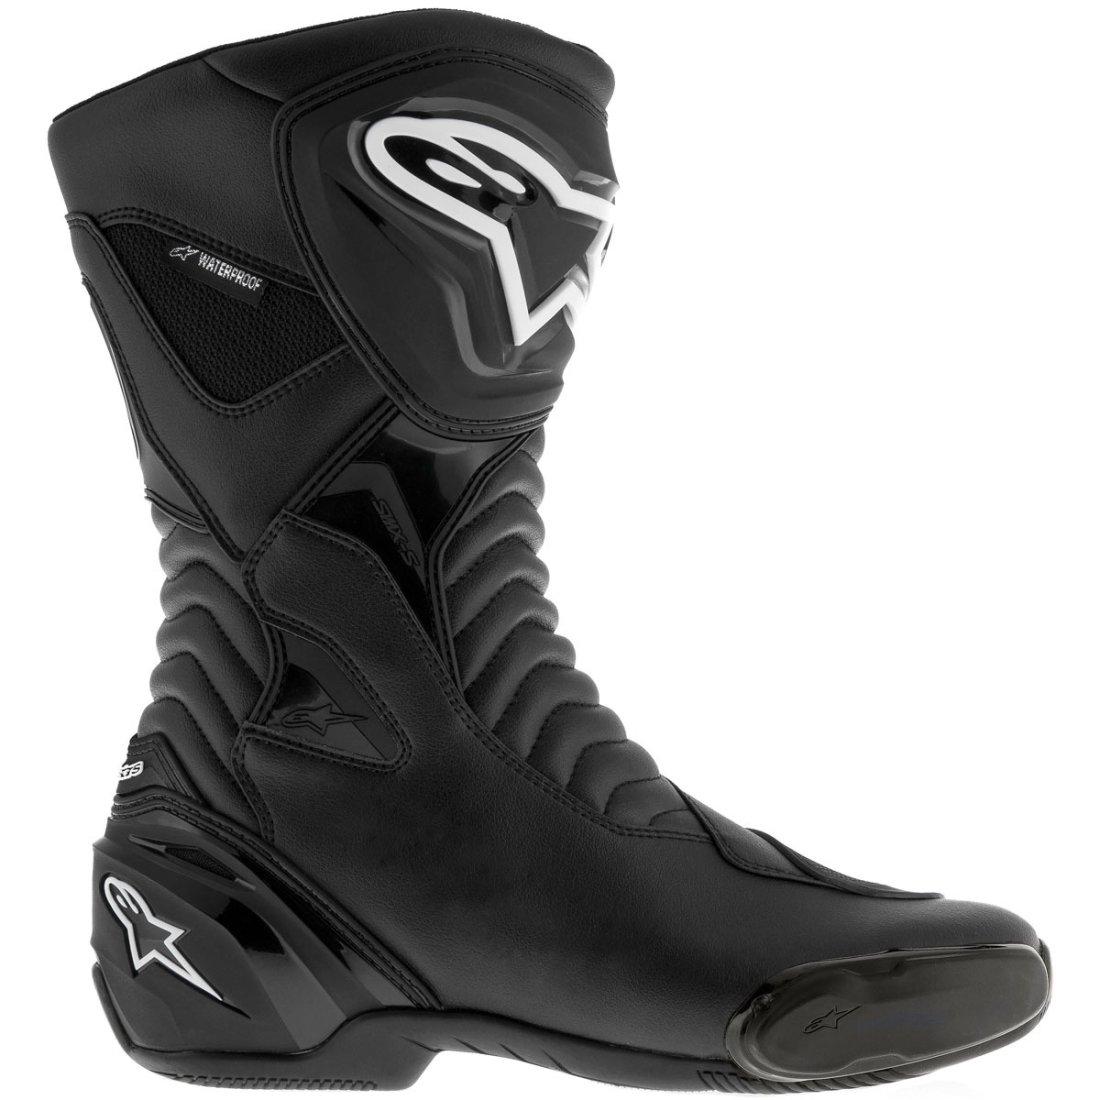 alpinestars smx s waterproof black boots motocard. Black Bedroom Furniture Sets. Home Design Ideas